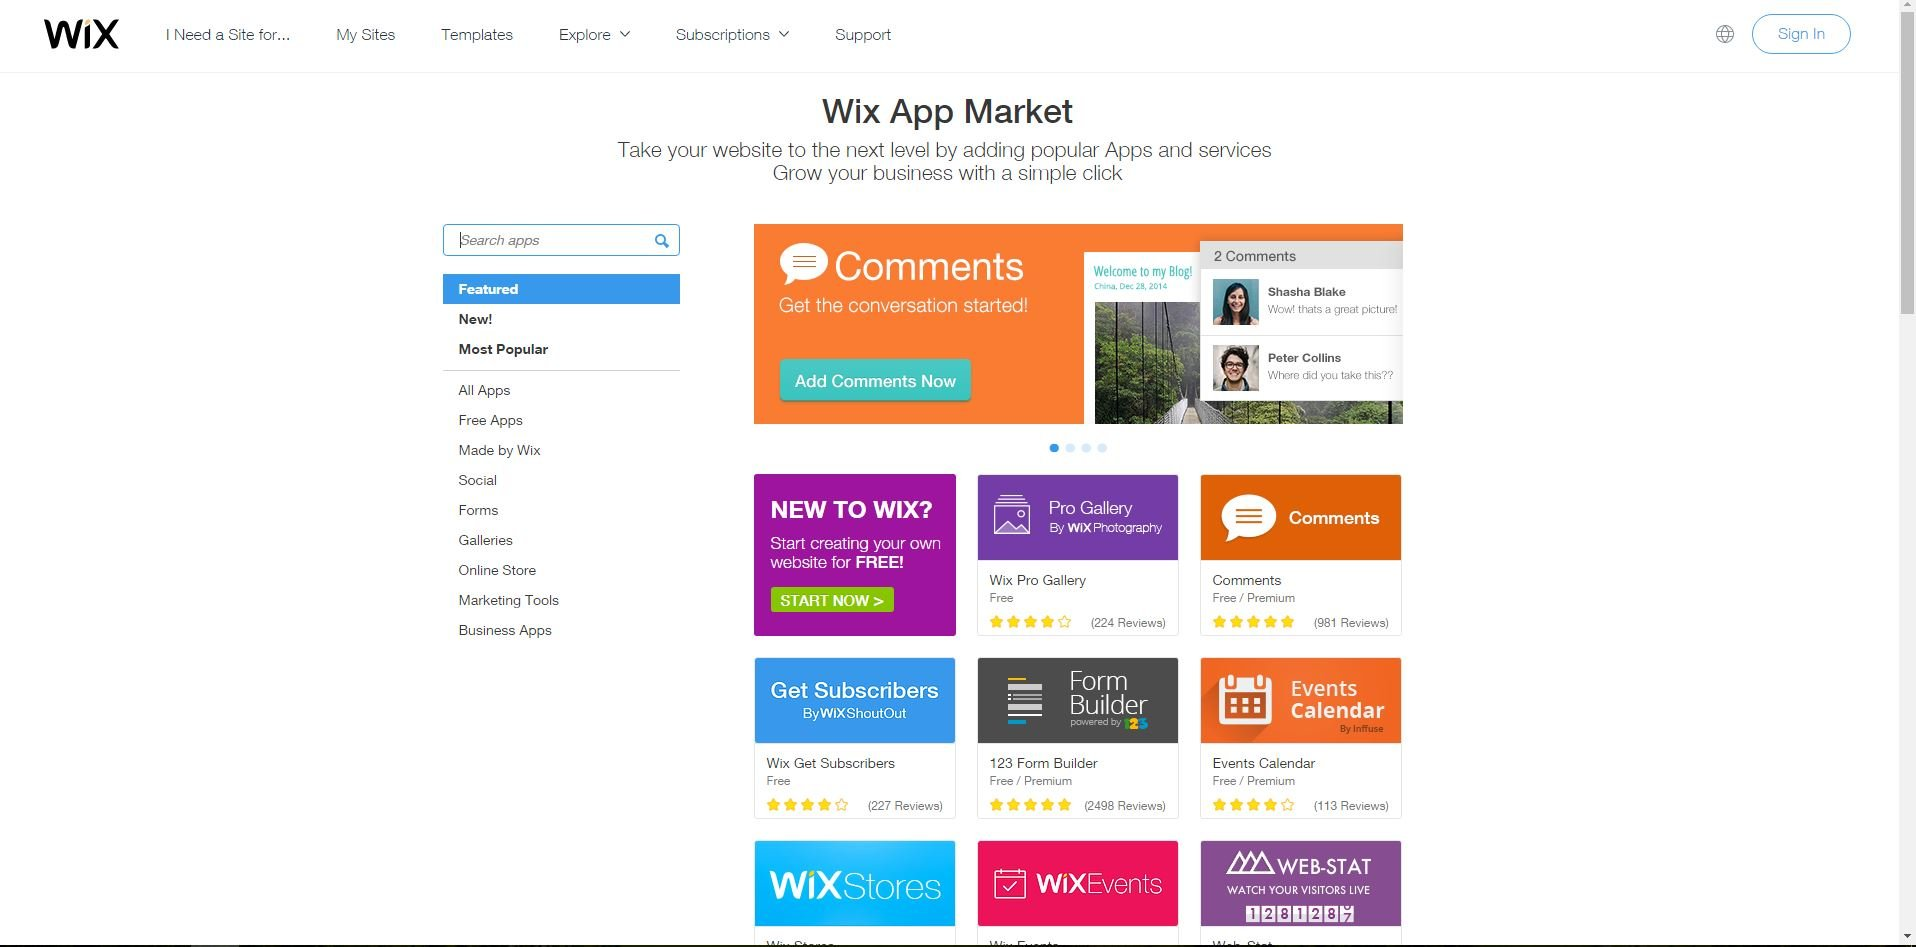 Wix app market